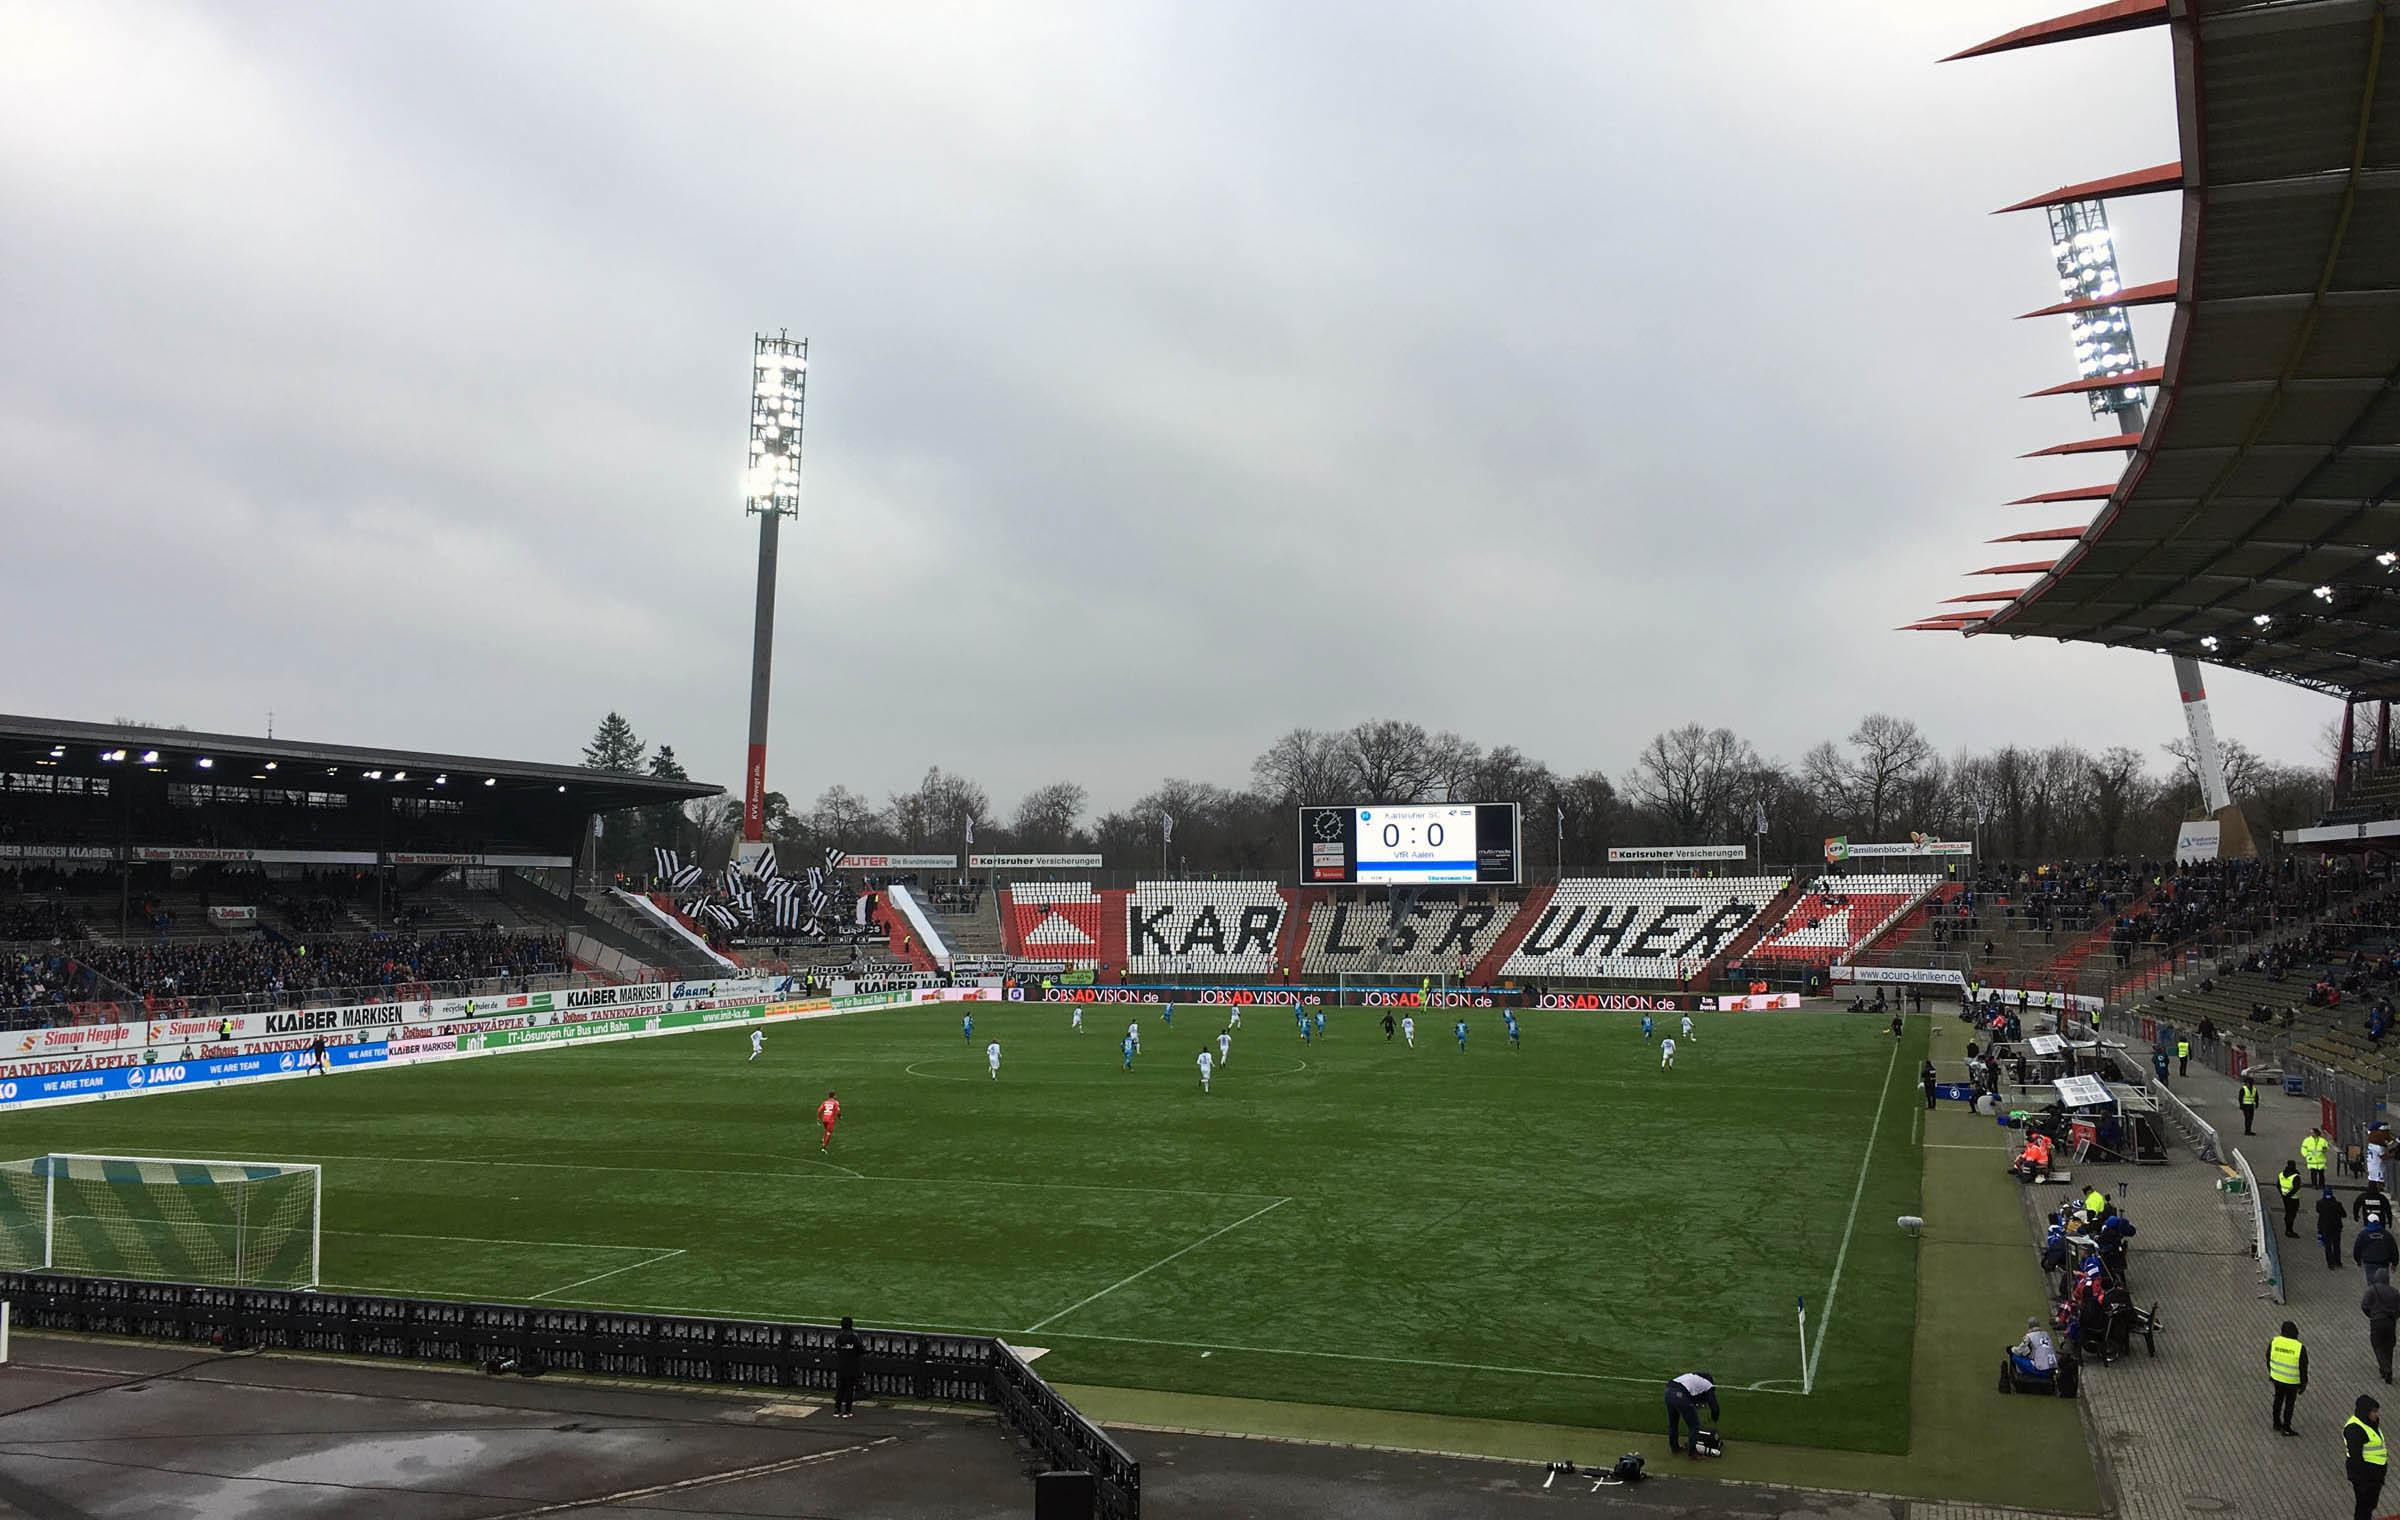 KSC vs VfR Aalen 0:0